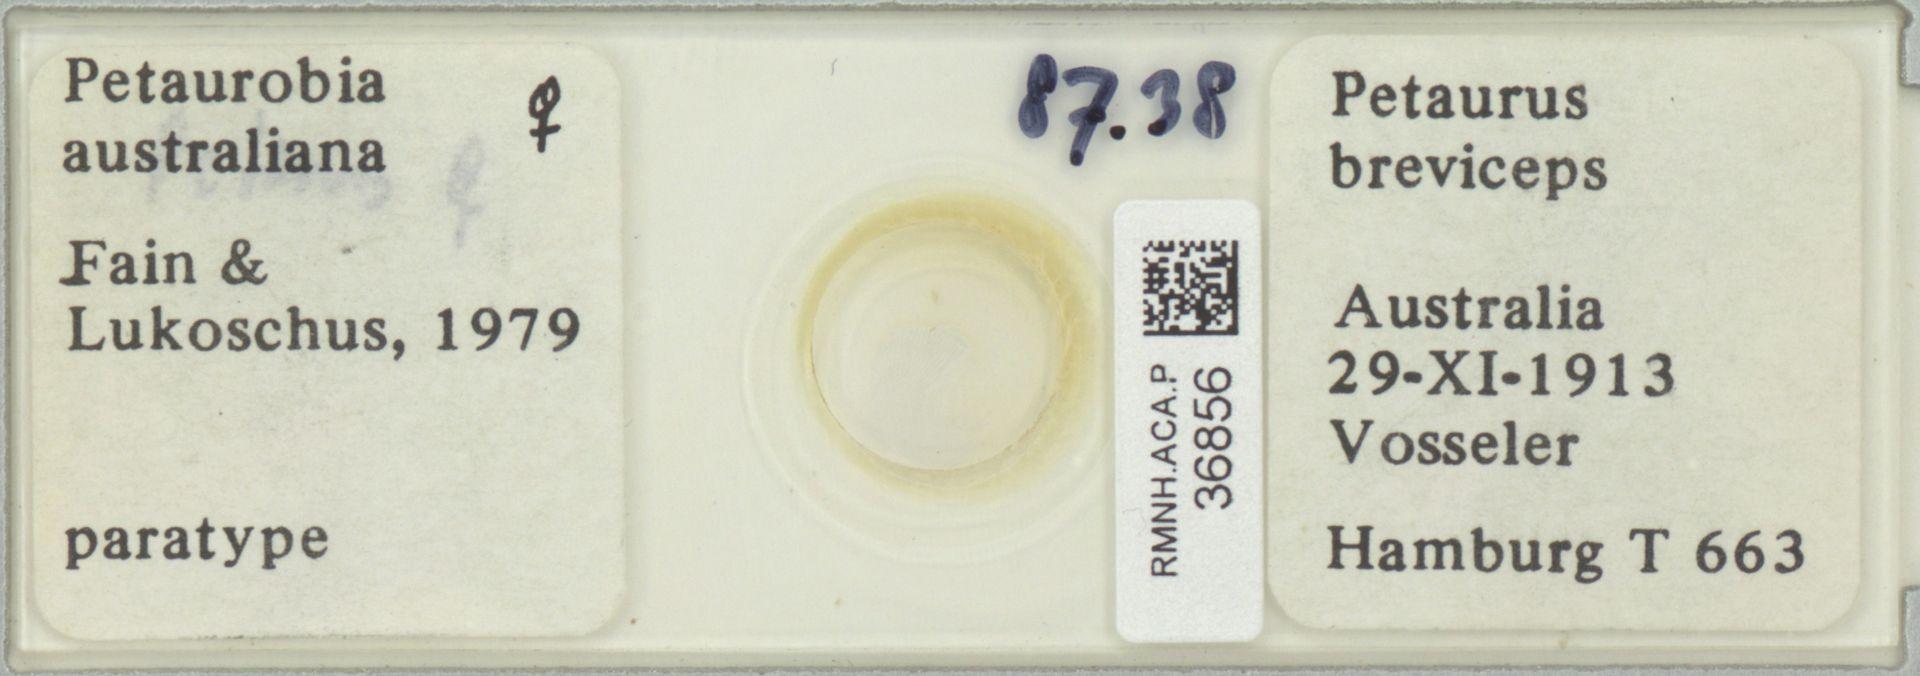 RMNH.ACA.P.36856   Petaurobia australiana Fain & Lukoschus 1979